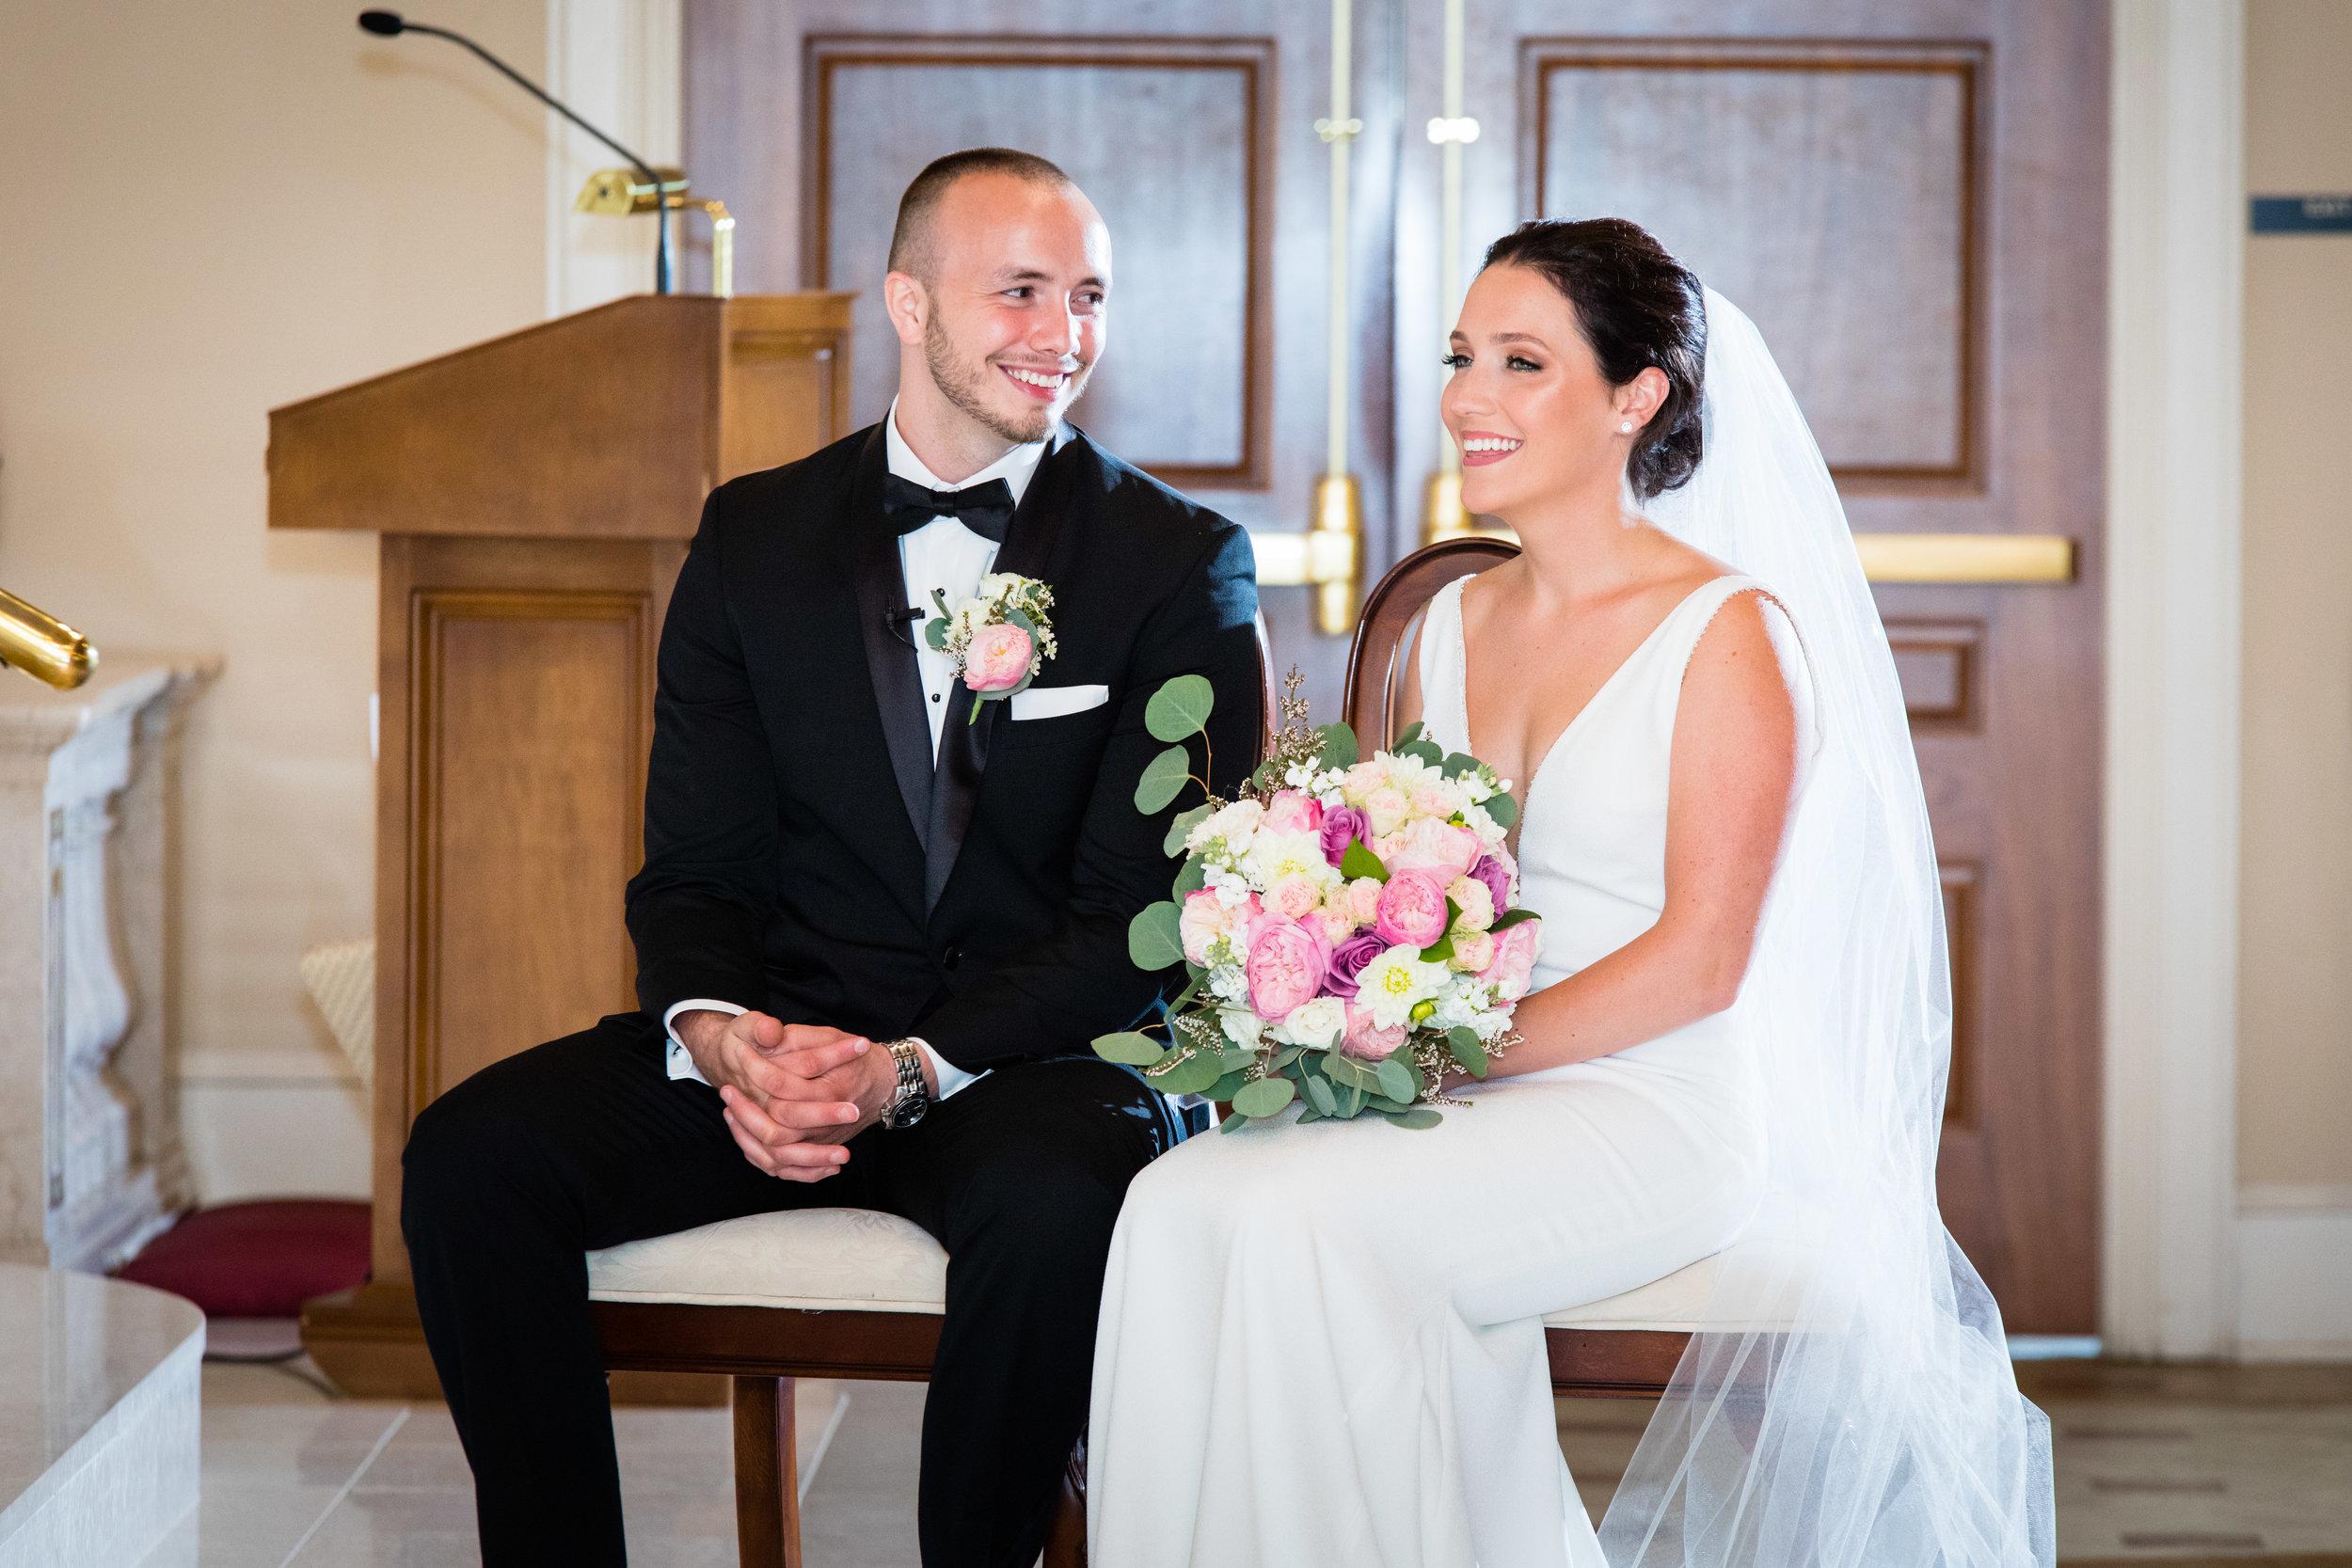 Sam and Mikes Wedding Photos - Pen Ryn Estate - 315.jpg